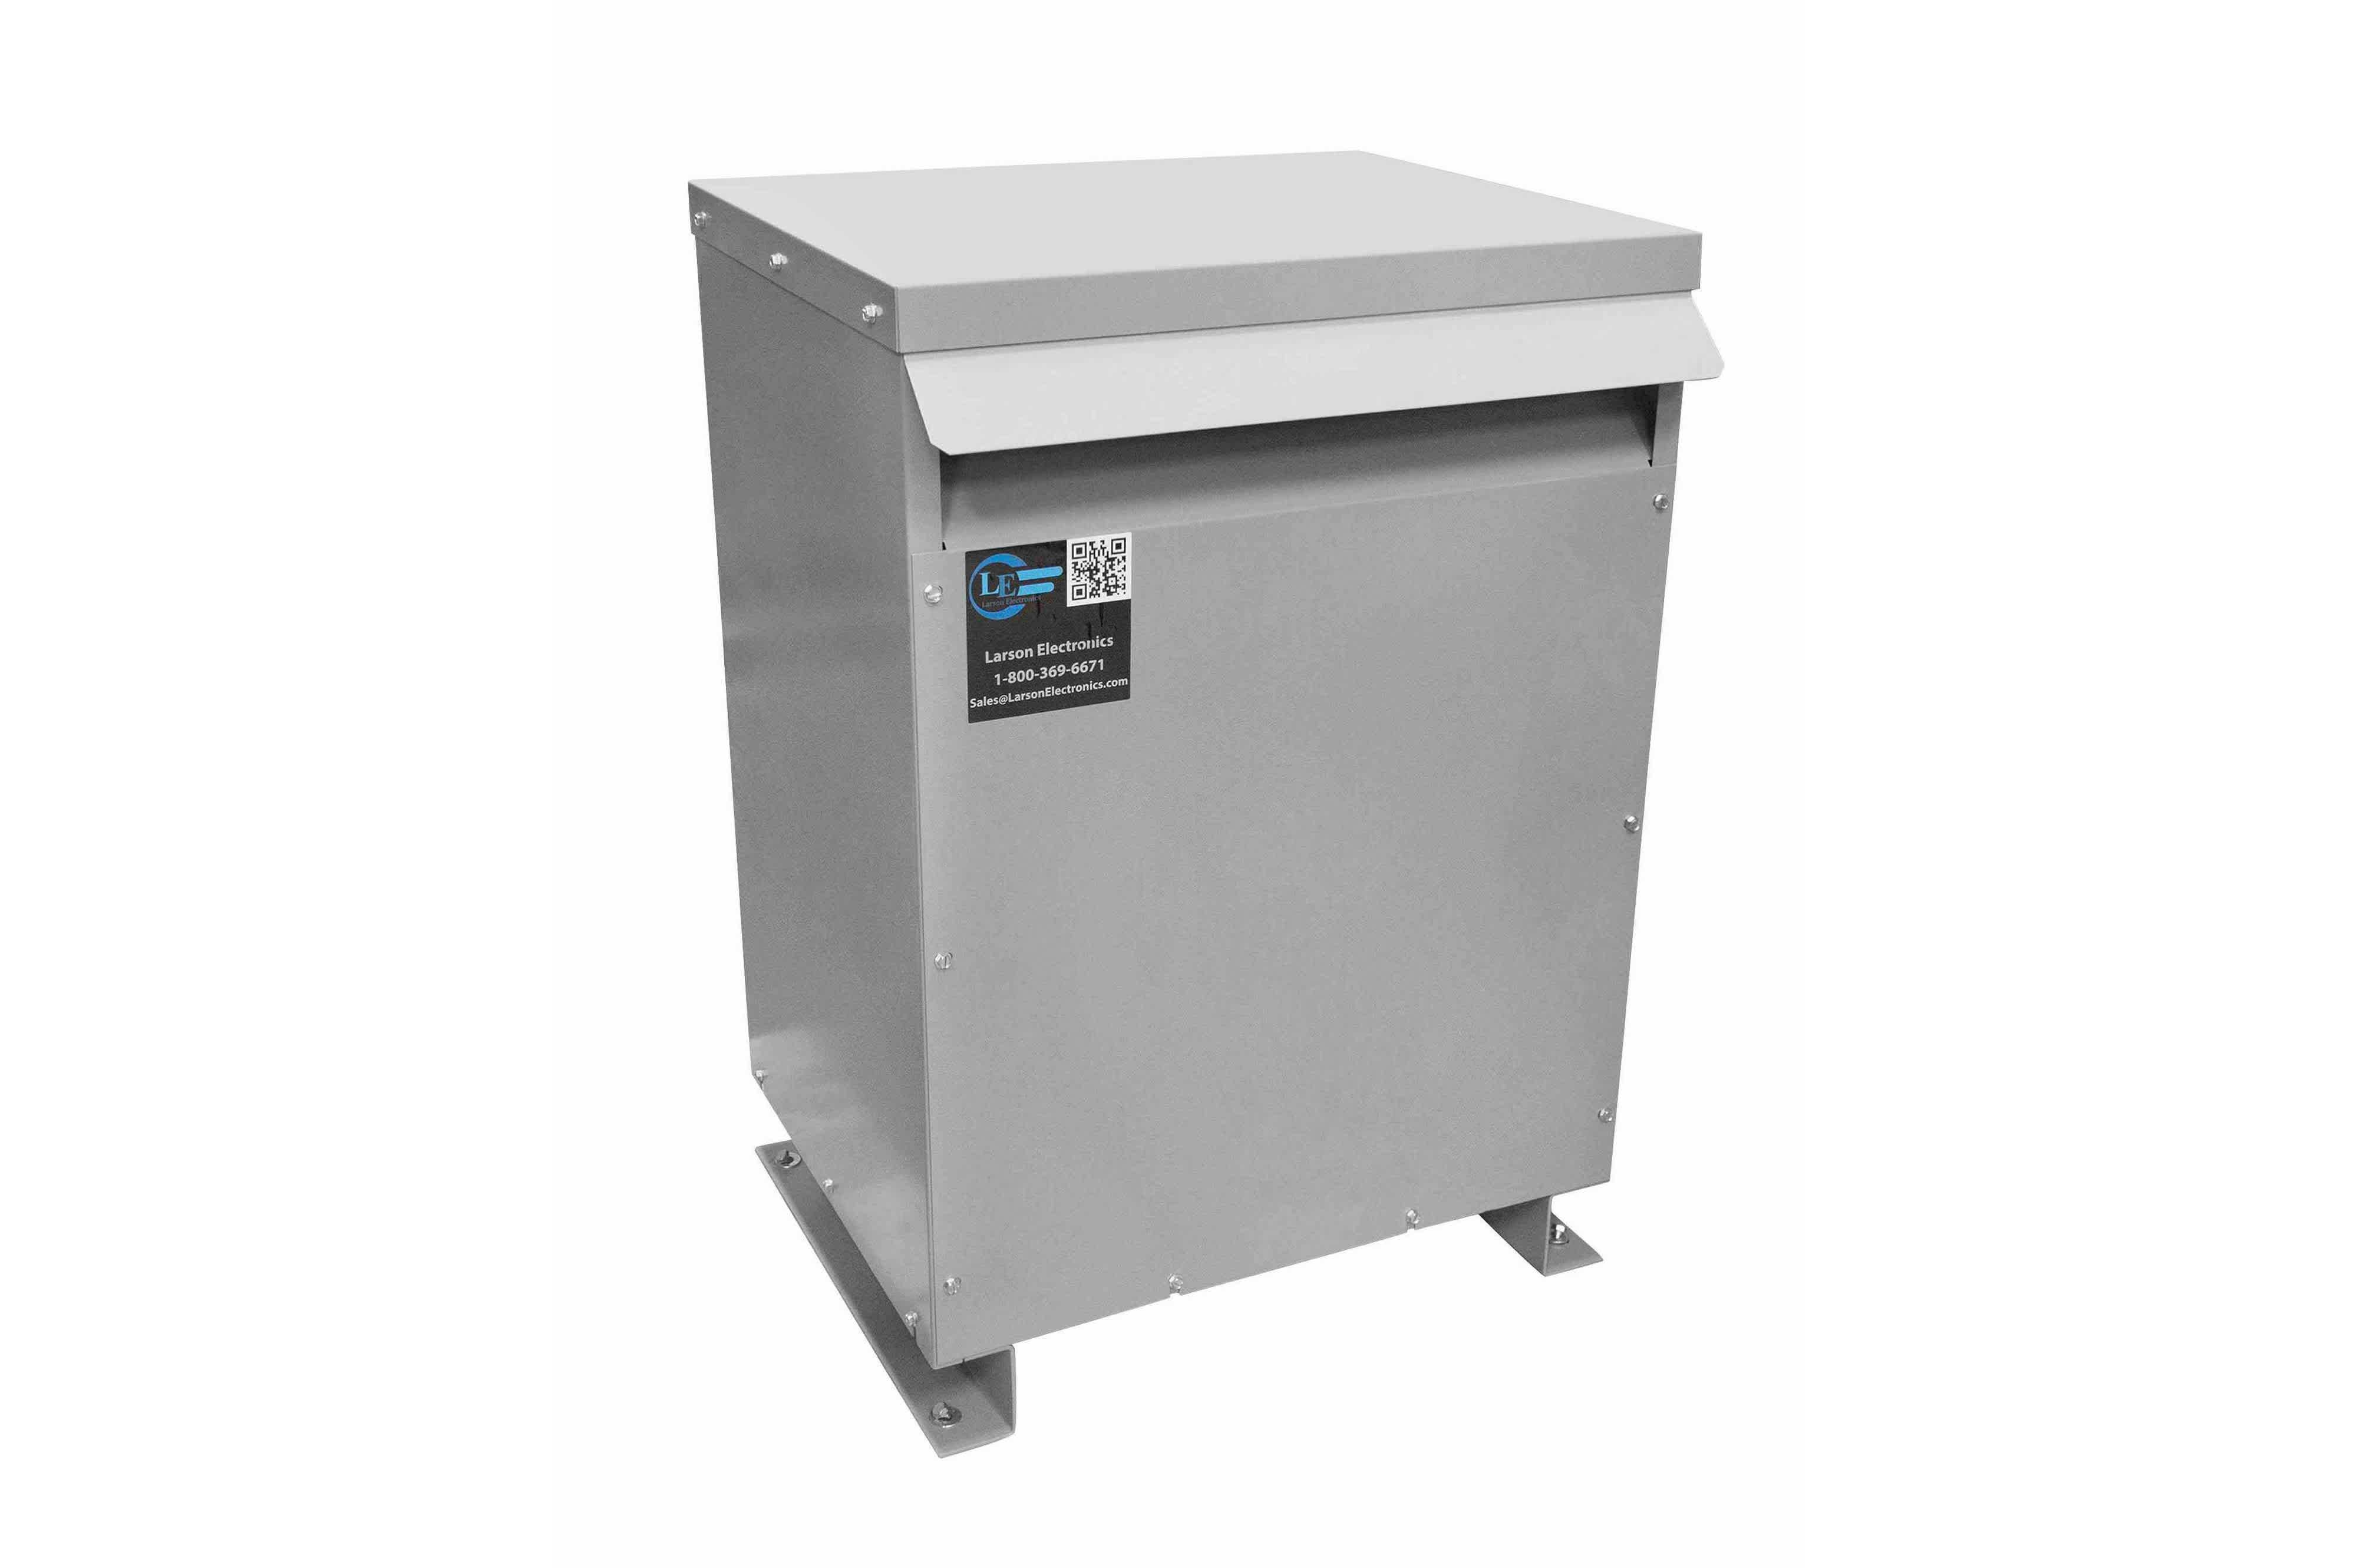 65 kVA 3PH Isolation Transformer, 575V Wye Primary, 208V Delta Secondary, N3R, Ventilated, 60 Hz